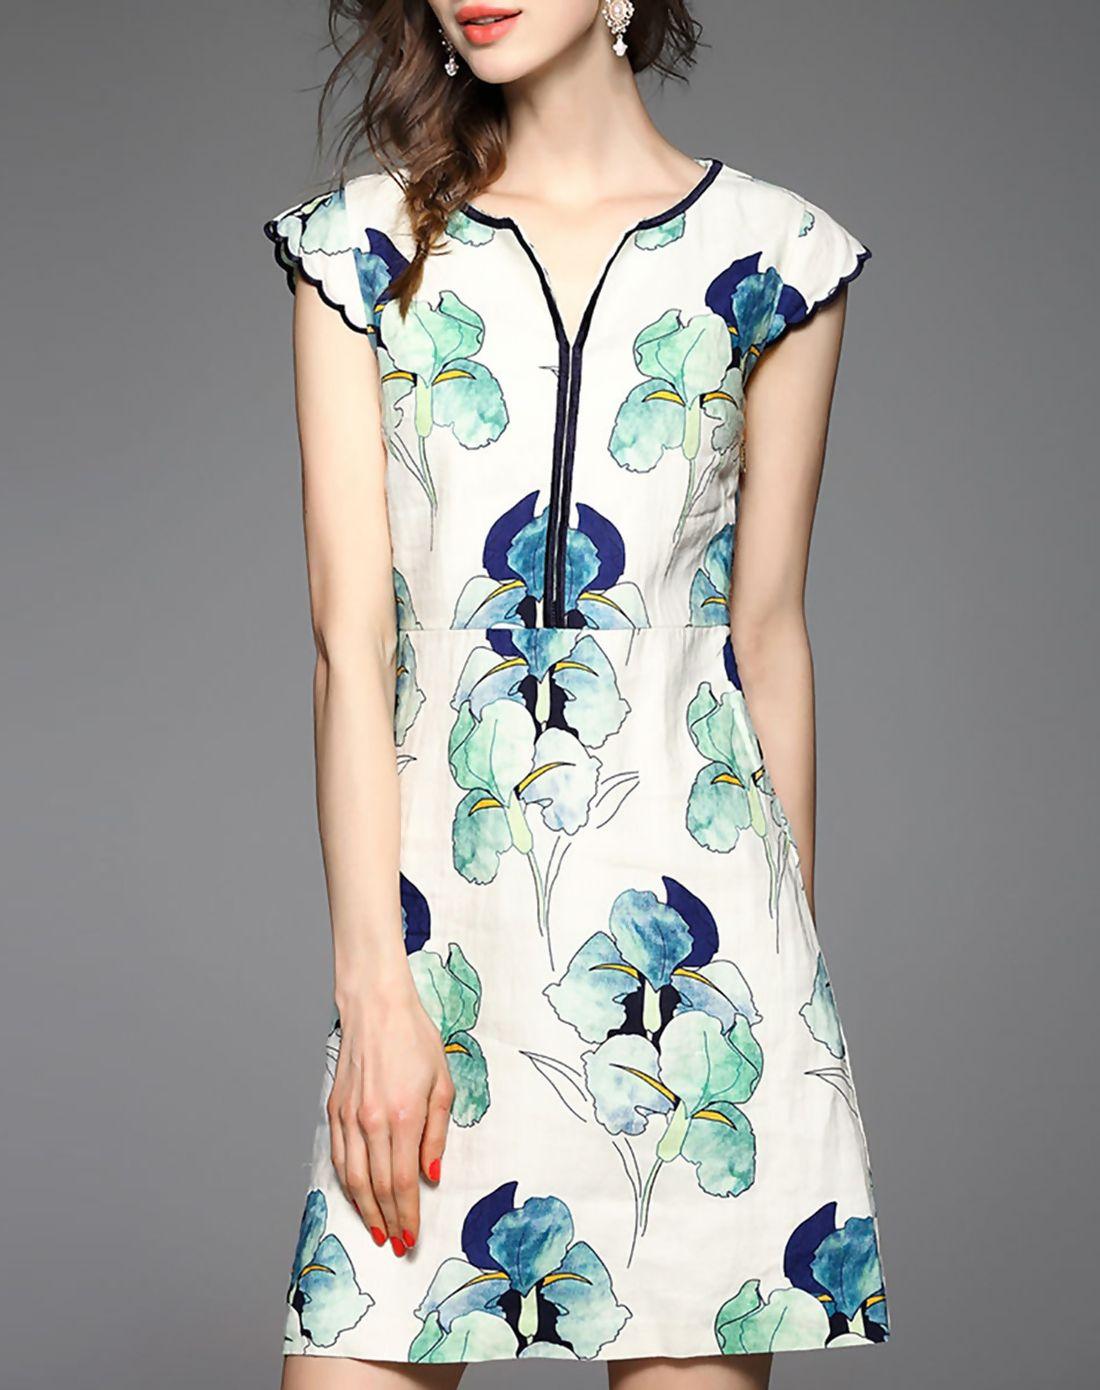 Green dress v neck  White Floral Print Vneck Linen Mini Dress  AdoreWe  Designer